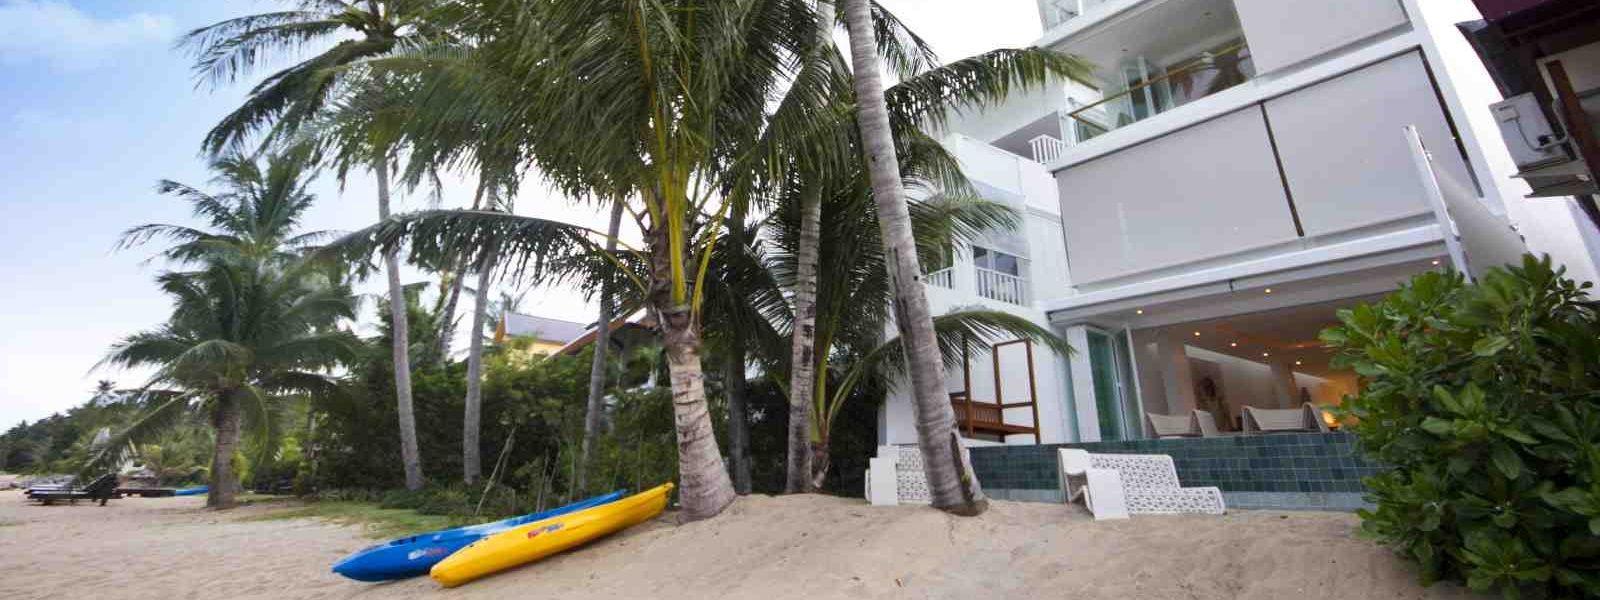 PANU Luxury Apartments by Kalara Developments Co., Ltd.